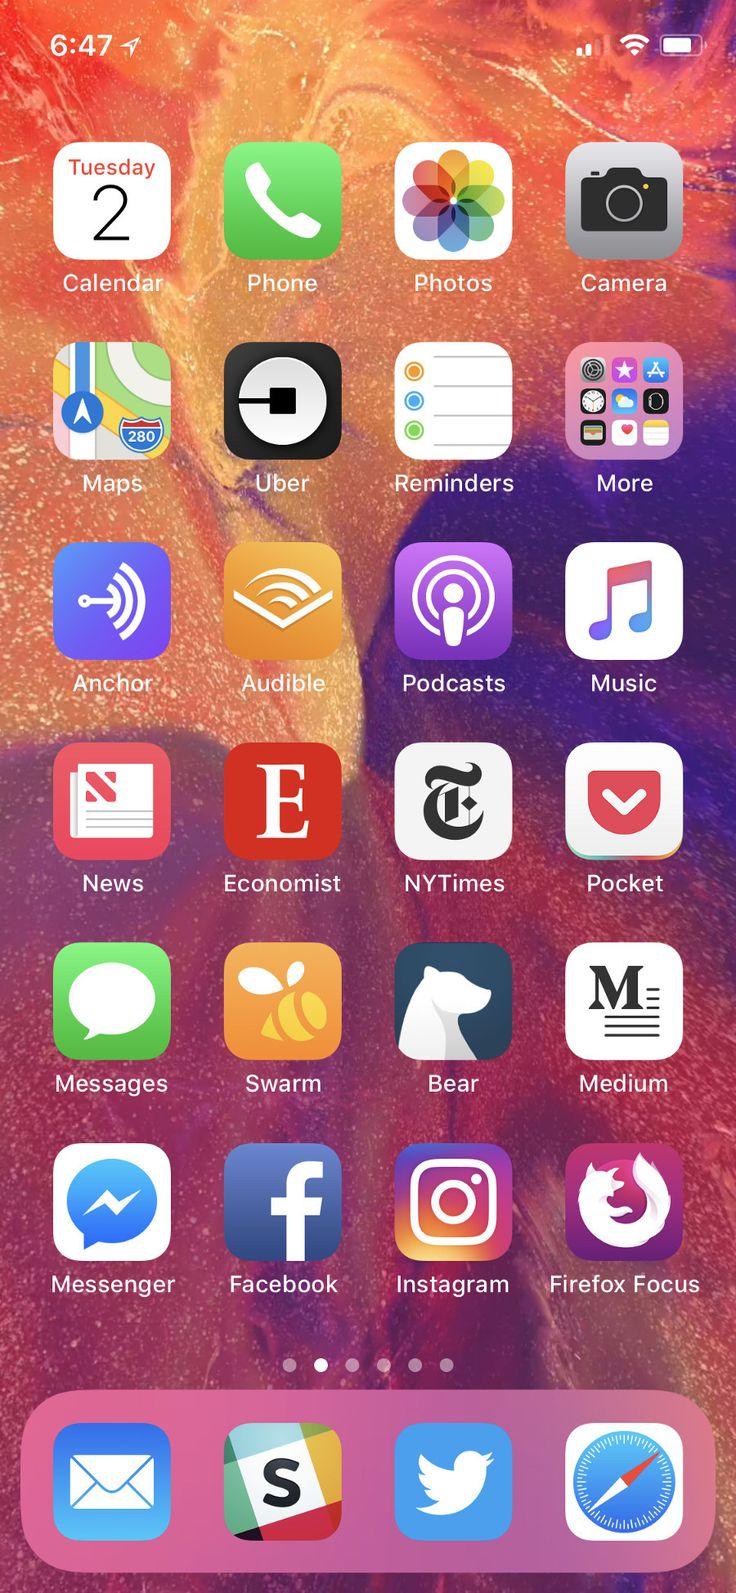 50 iPhone Home Screen Layout Ideas 2017 Gv4c di 2020